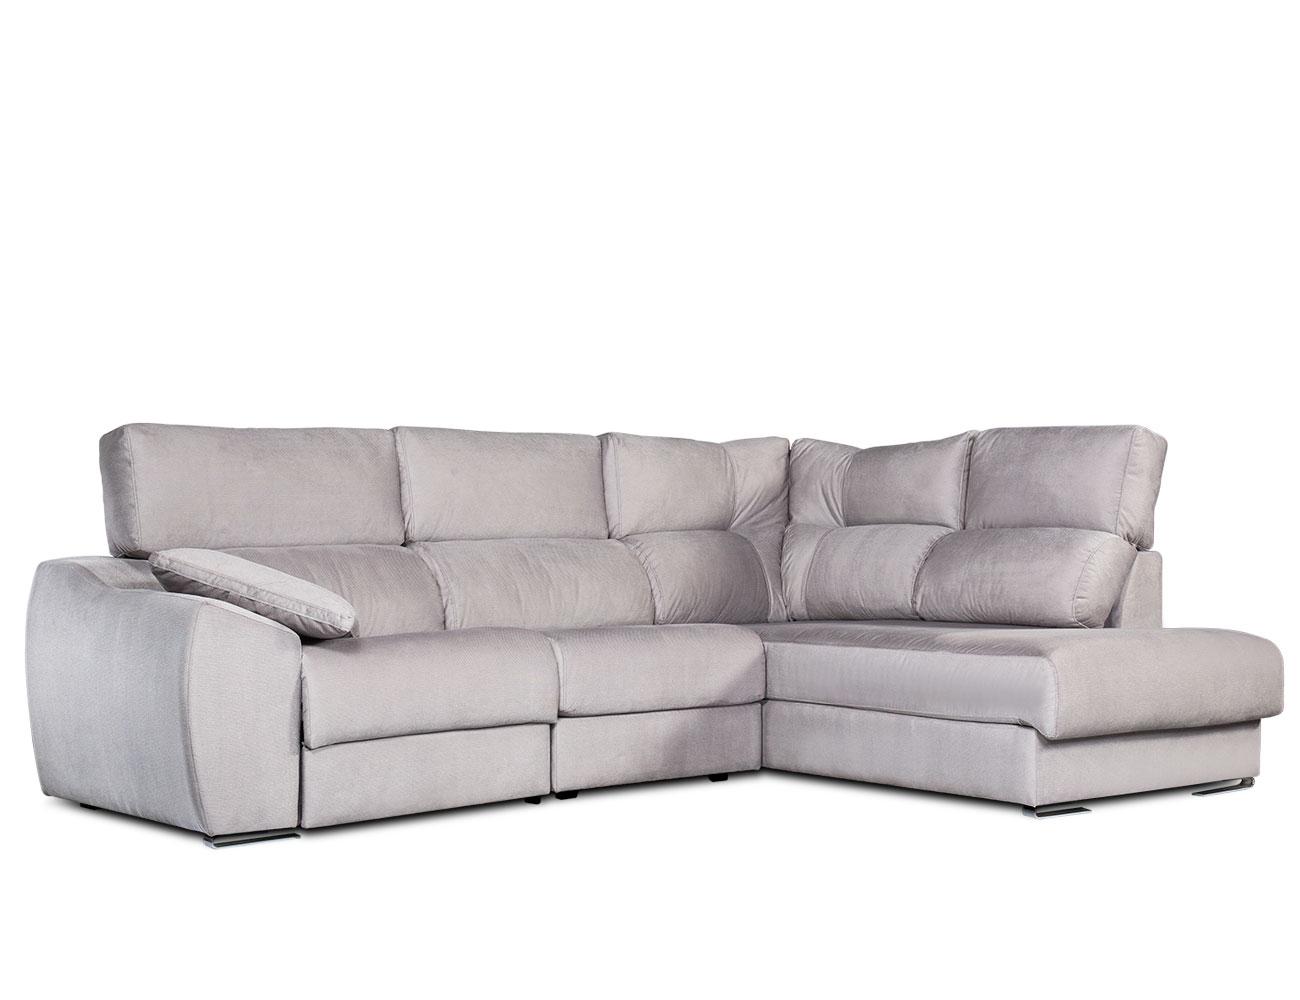 Sofa chaiselongue rincon electrico5